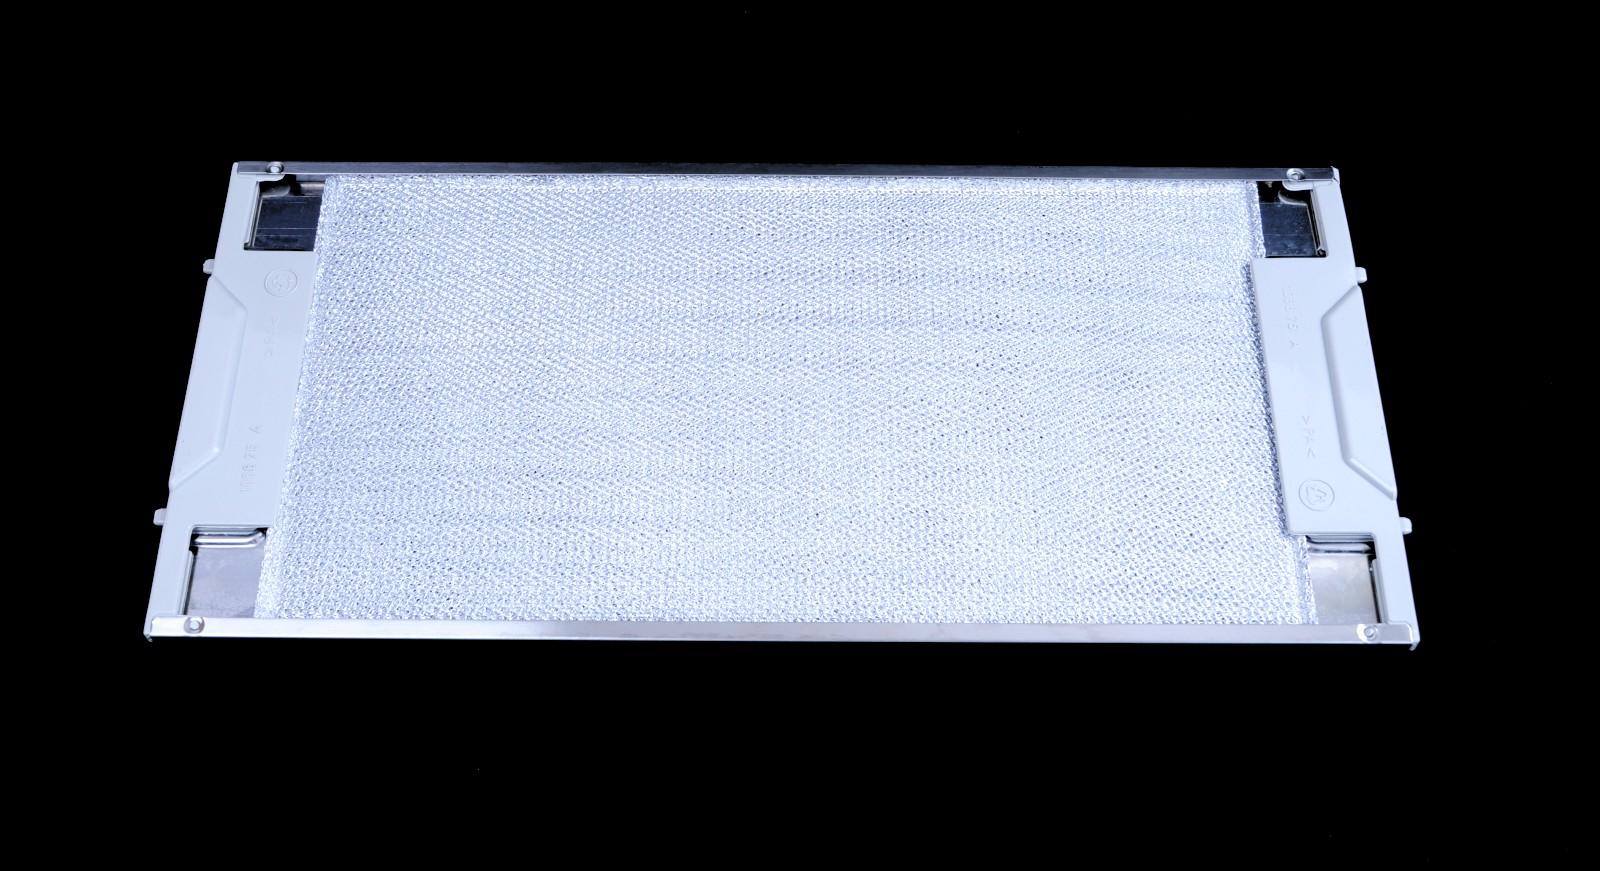 AEG Metall Fettfilter Dunsthaube 435x200x8mm 2Griffe